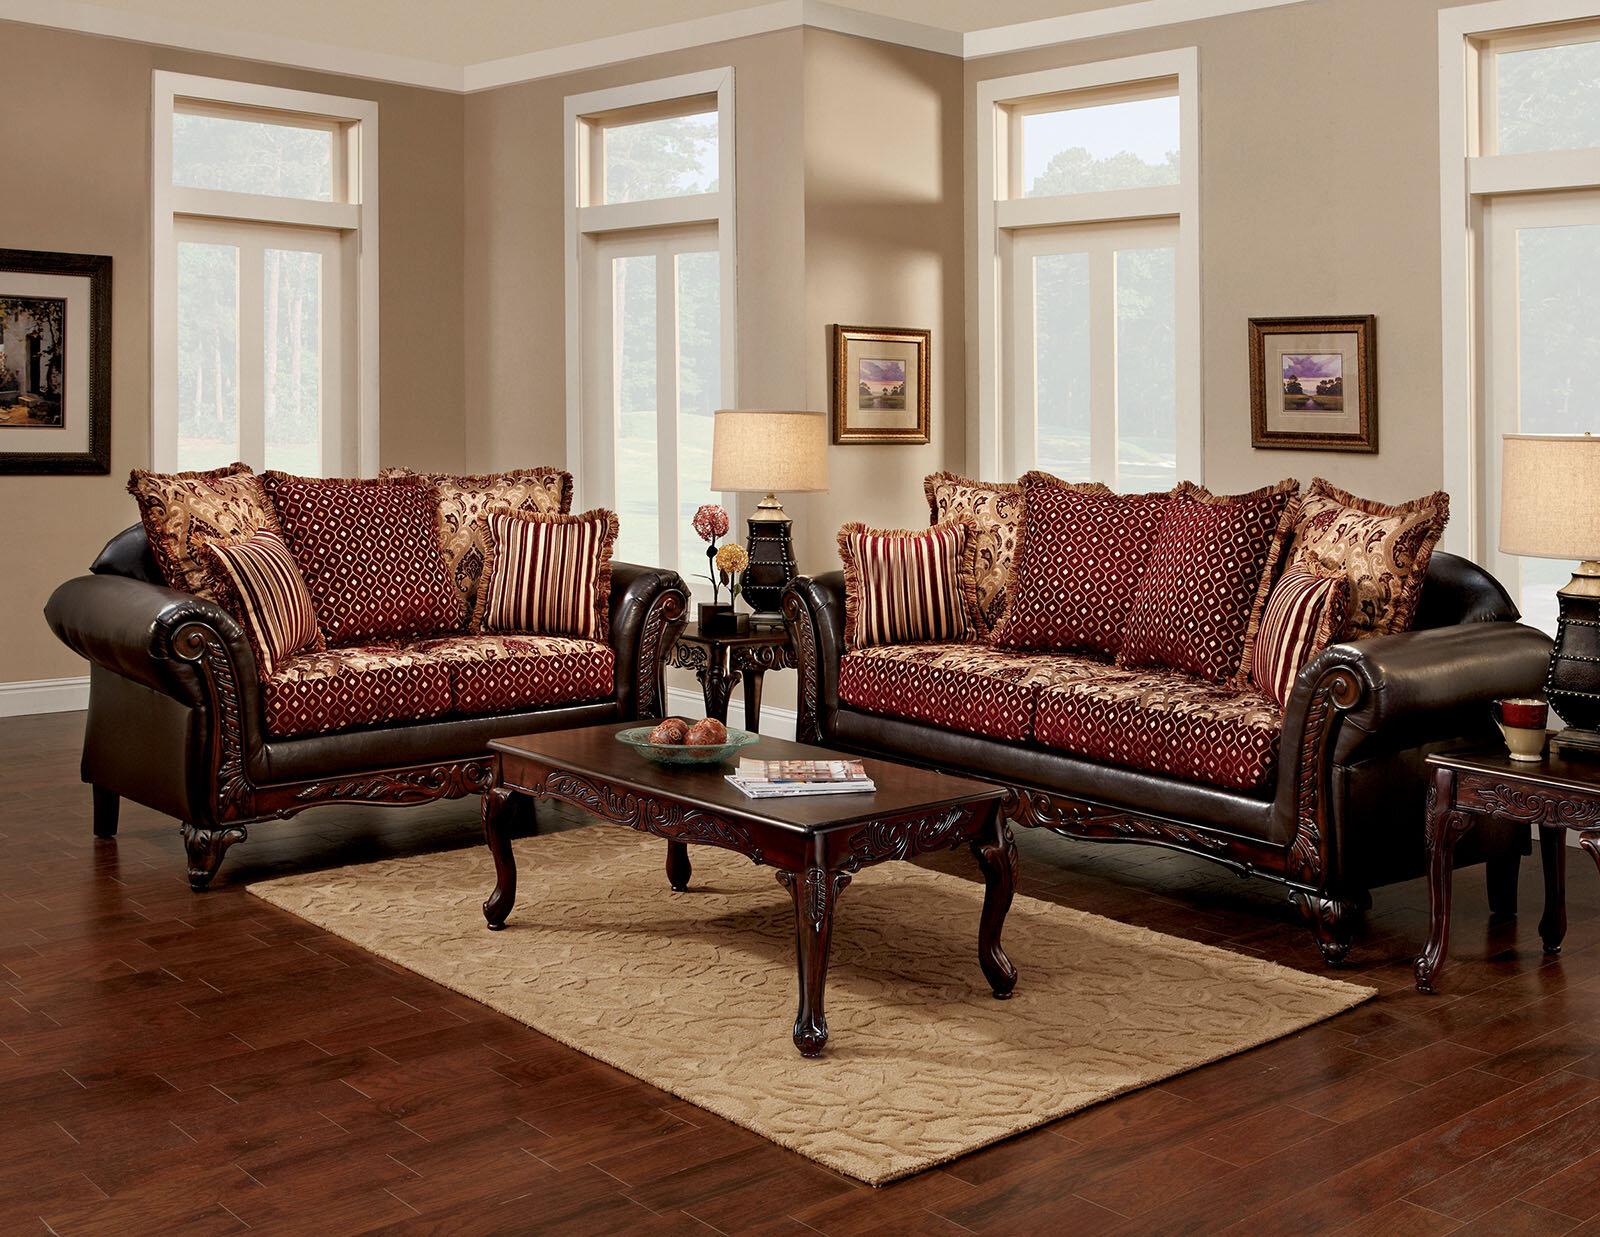 Fleur de lis living charters towers configurable living room set wayfair